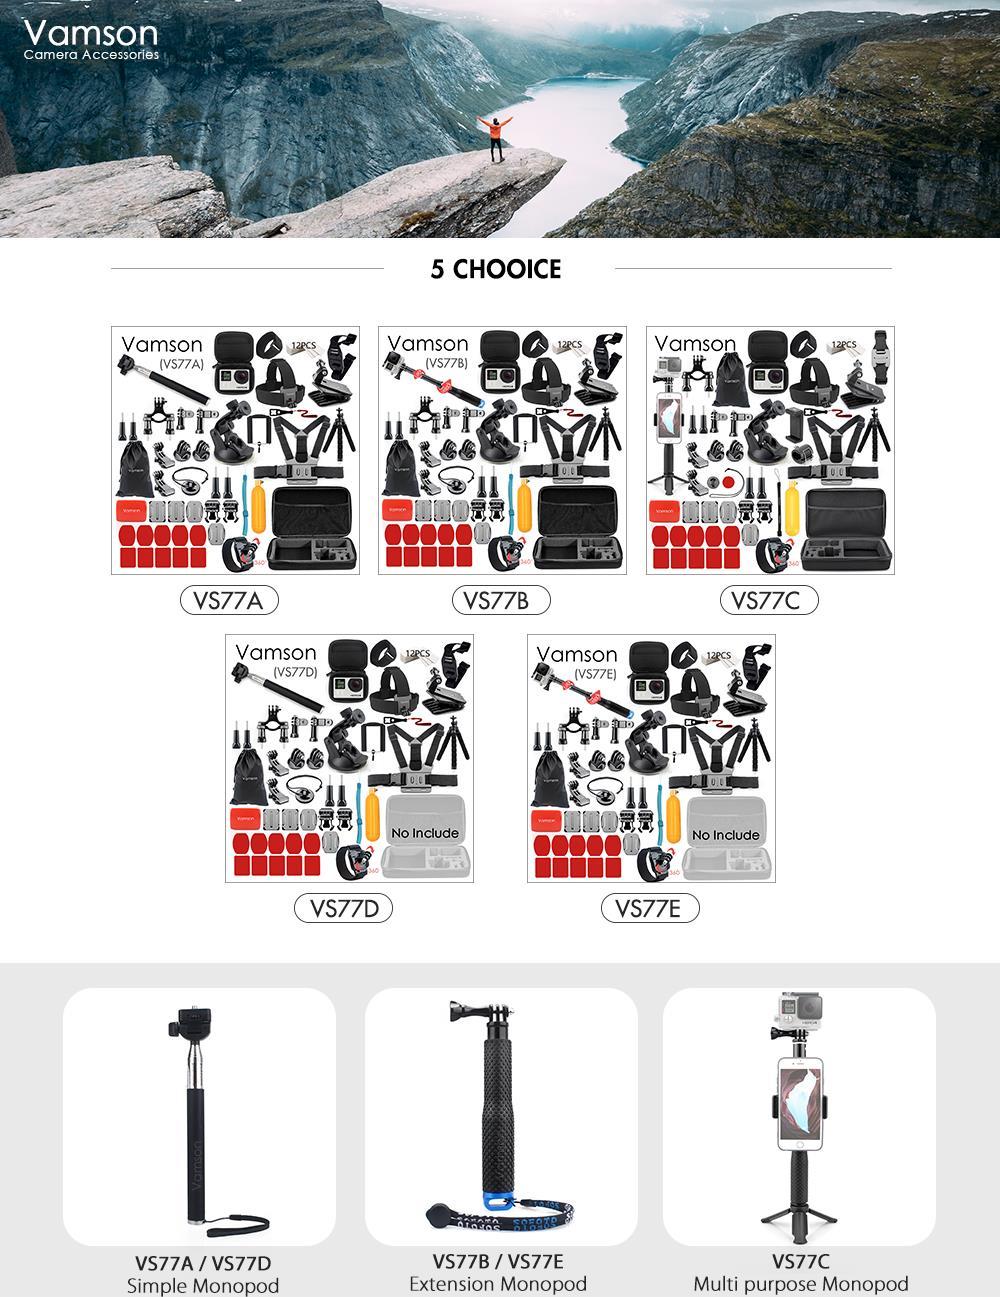 action camera Vamson Gopro Camera Accessories HTB1qHTMXovrK1RjSszfq6xJNVXa5